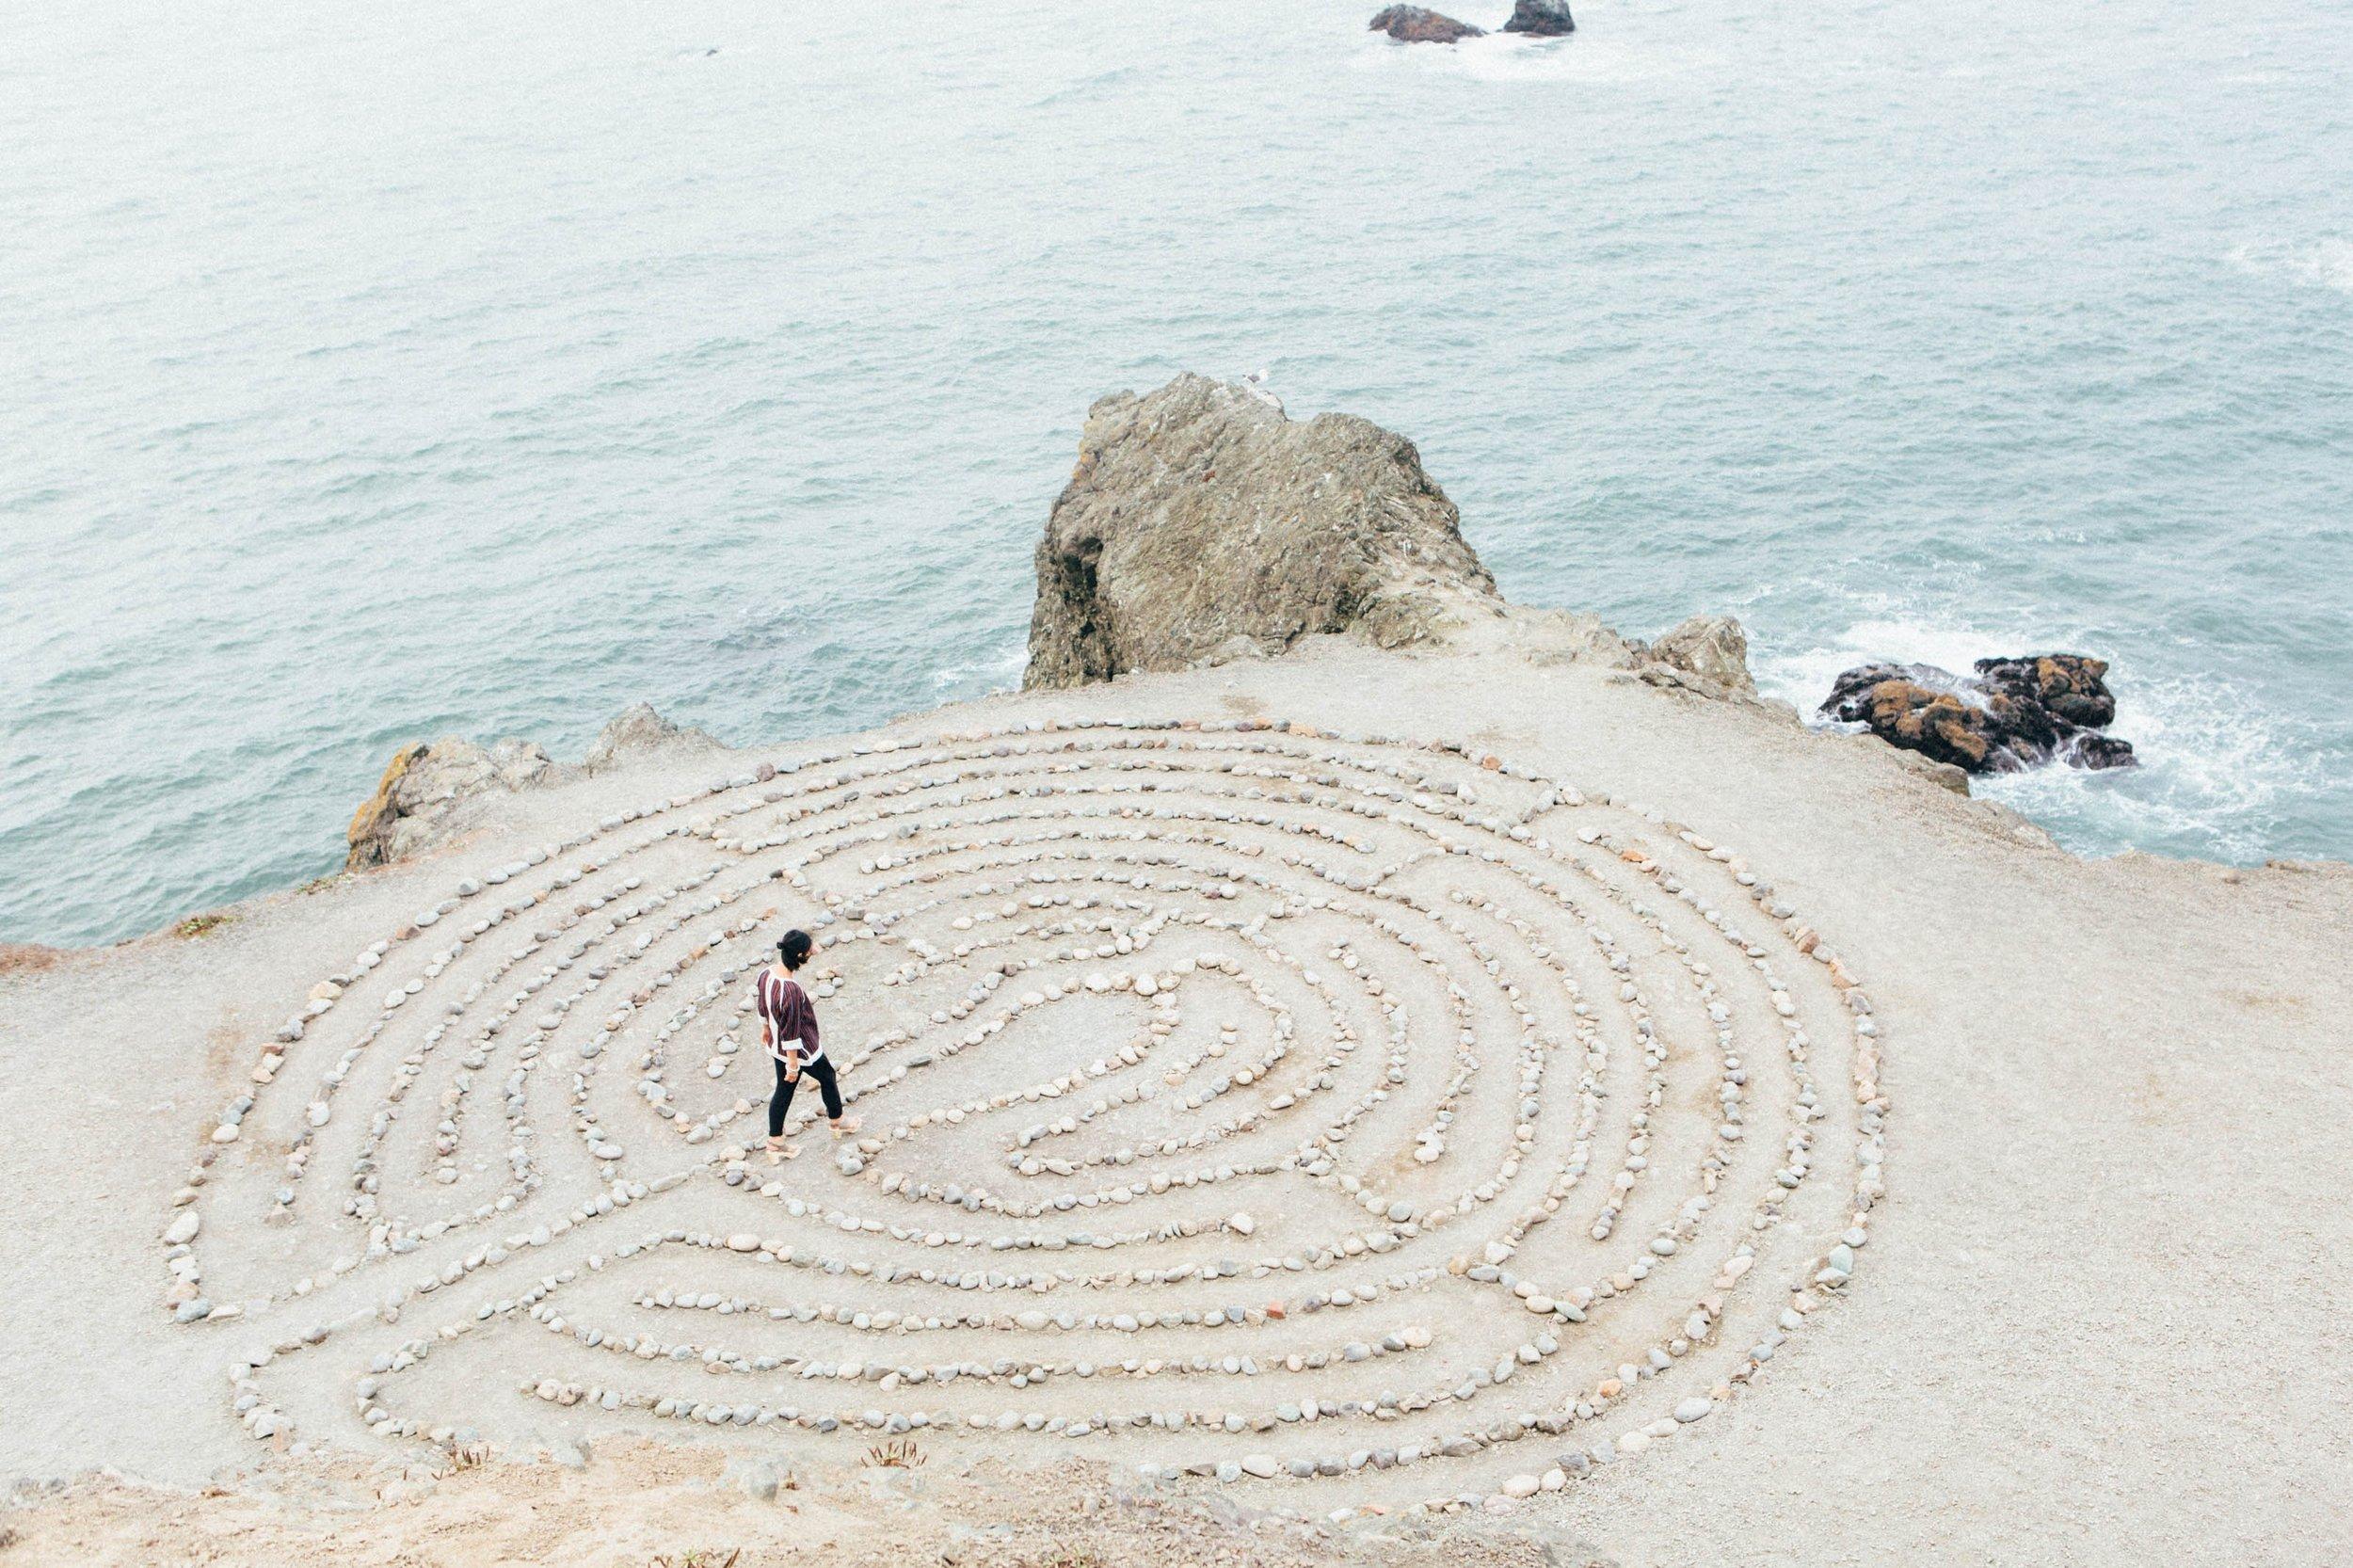 labyrinth-ashley-batz-1298-unsplash.jpg